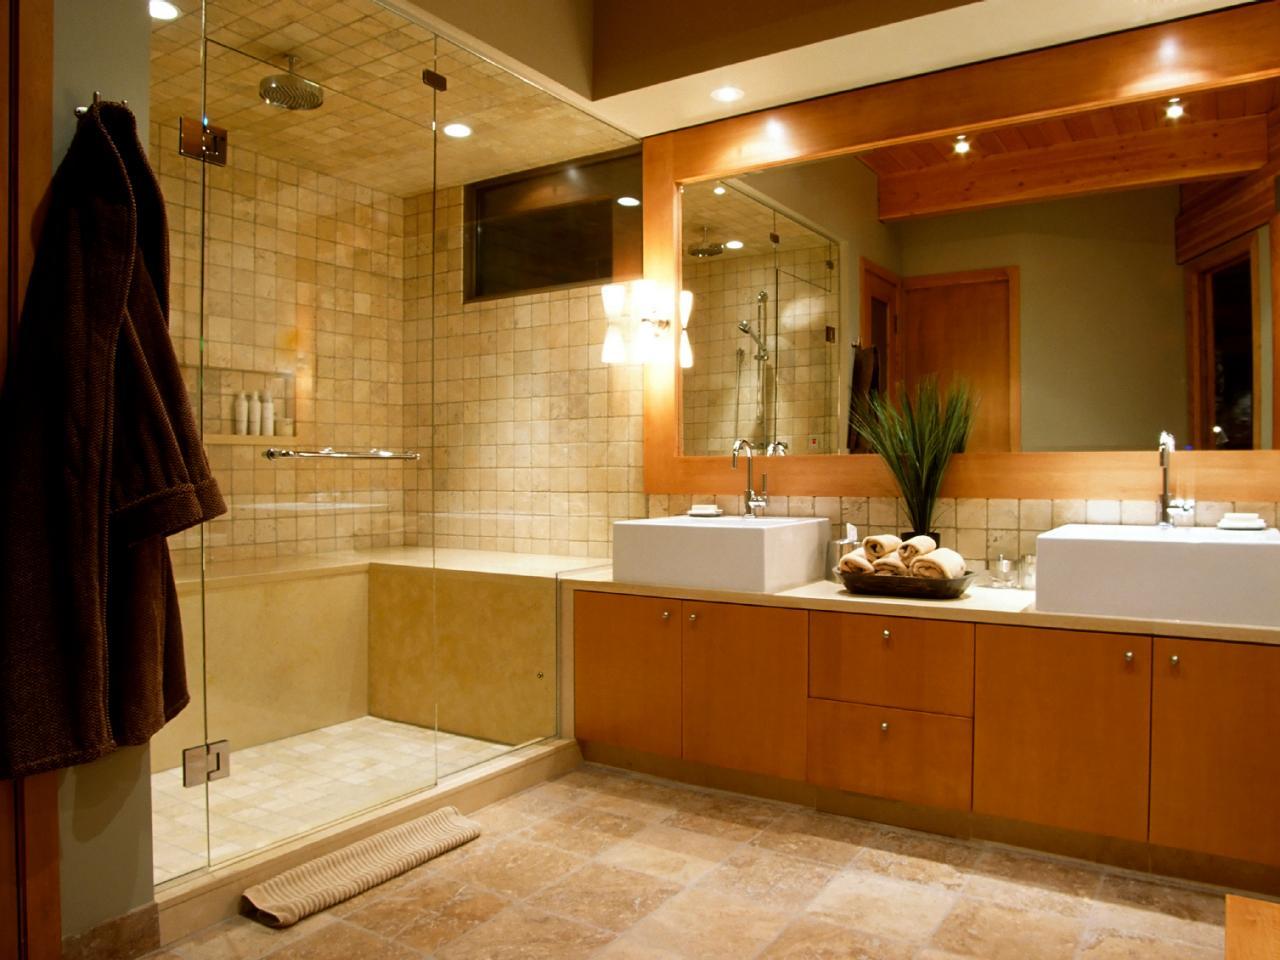 Bathroom Lighting HGTV -  bathroom lighting